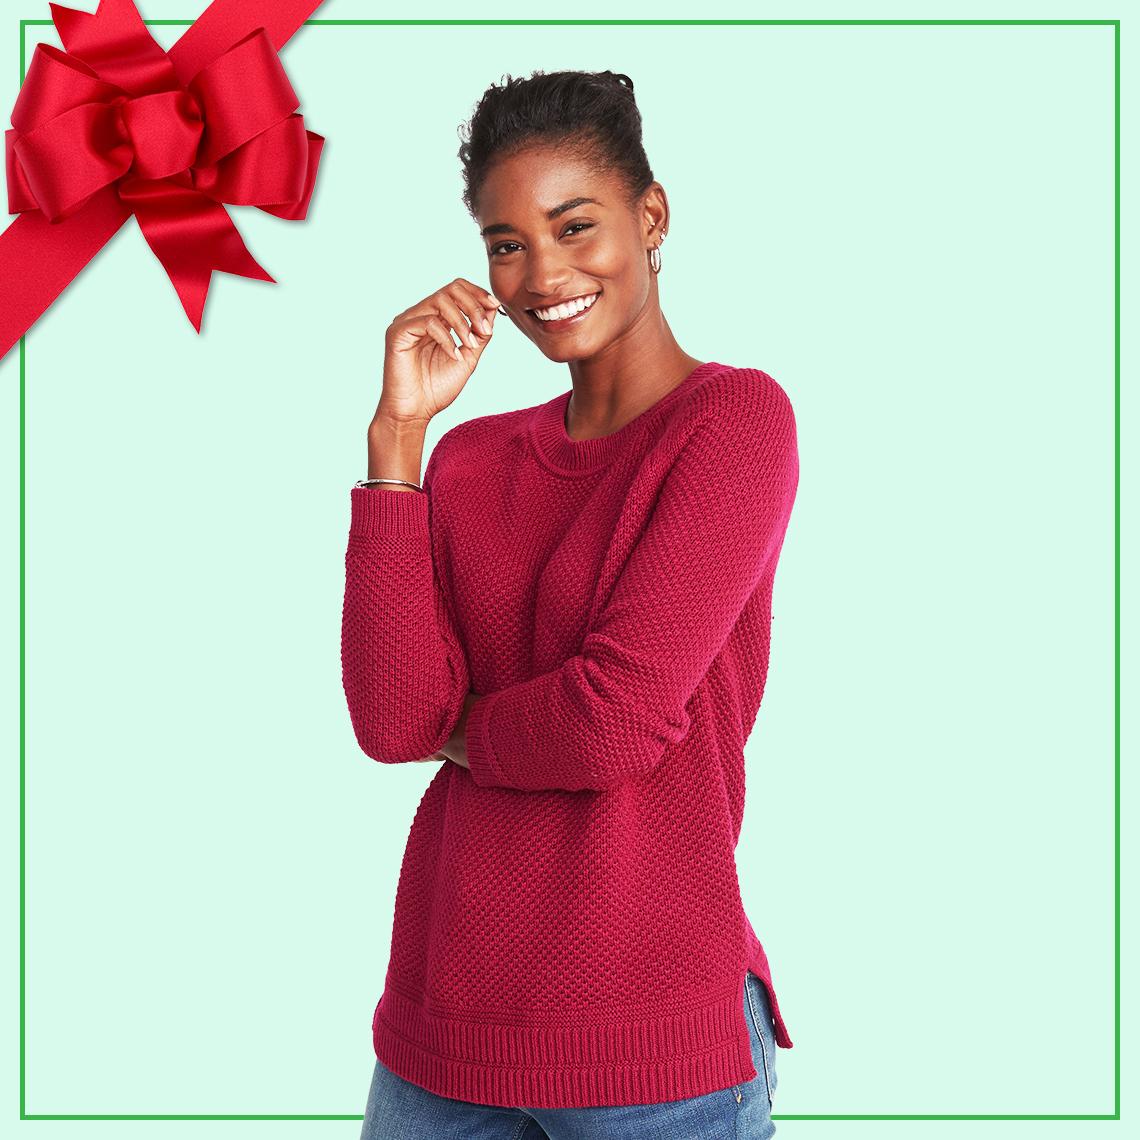 A woman wearing a raspberry sweater